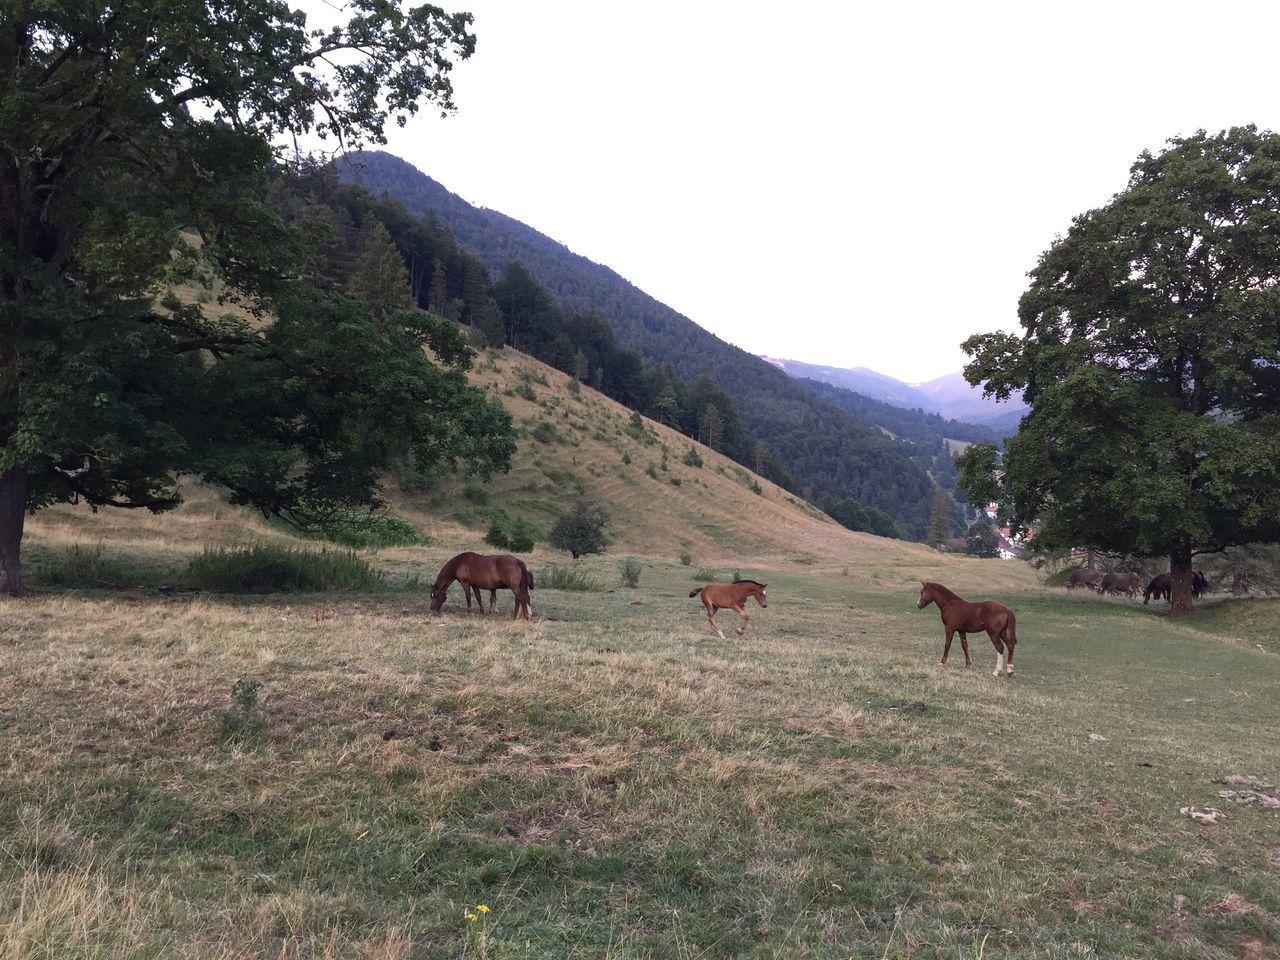 animal, horse, field, nature, undervelier, jura, switzerland, Found On The Roll